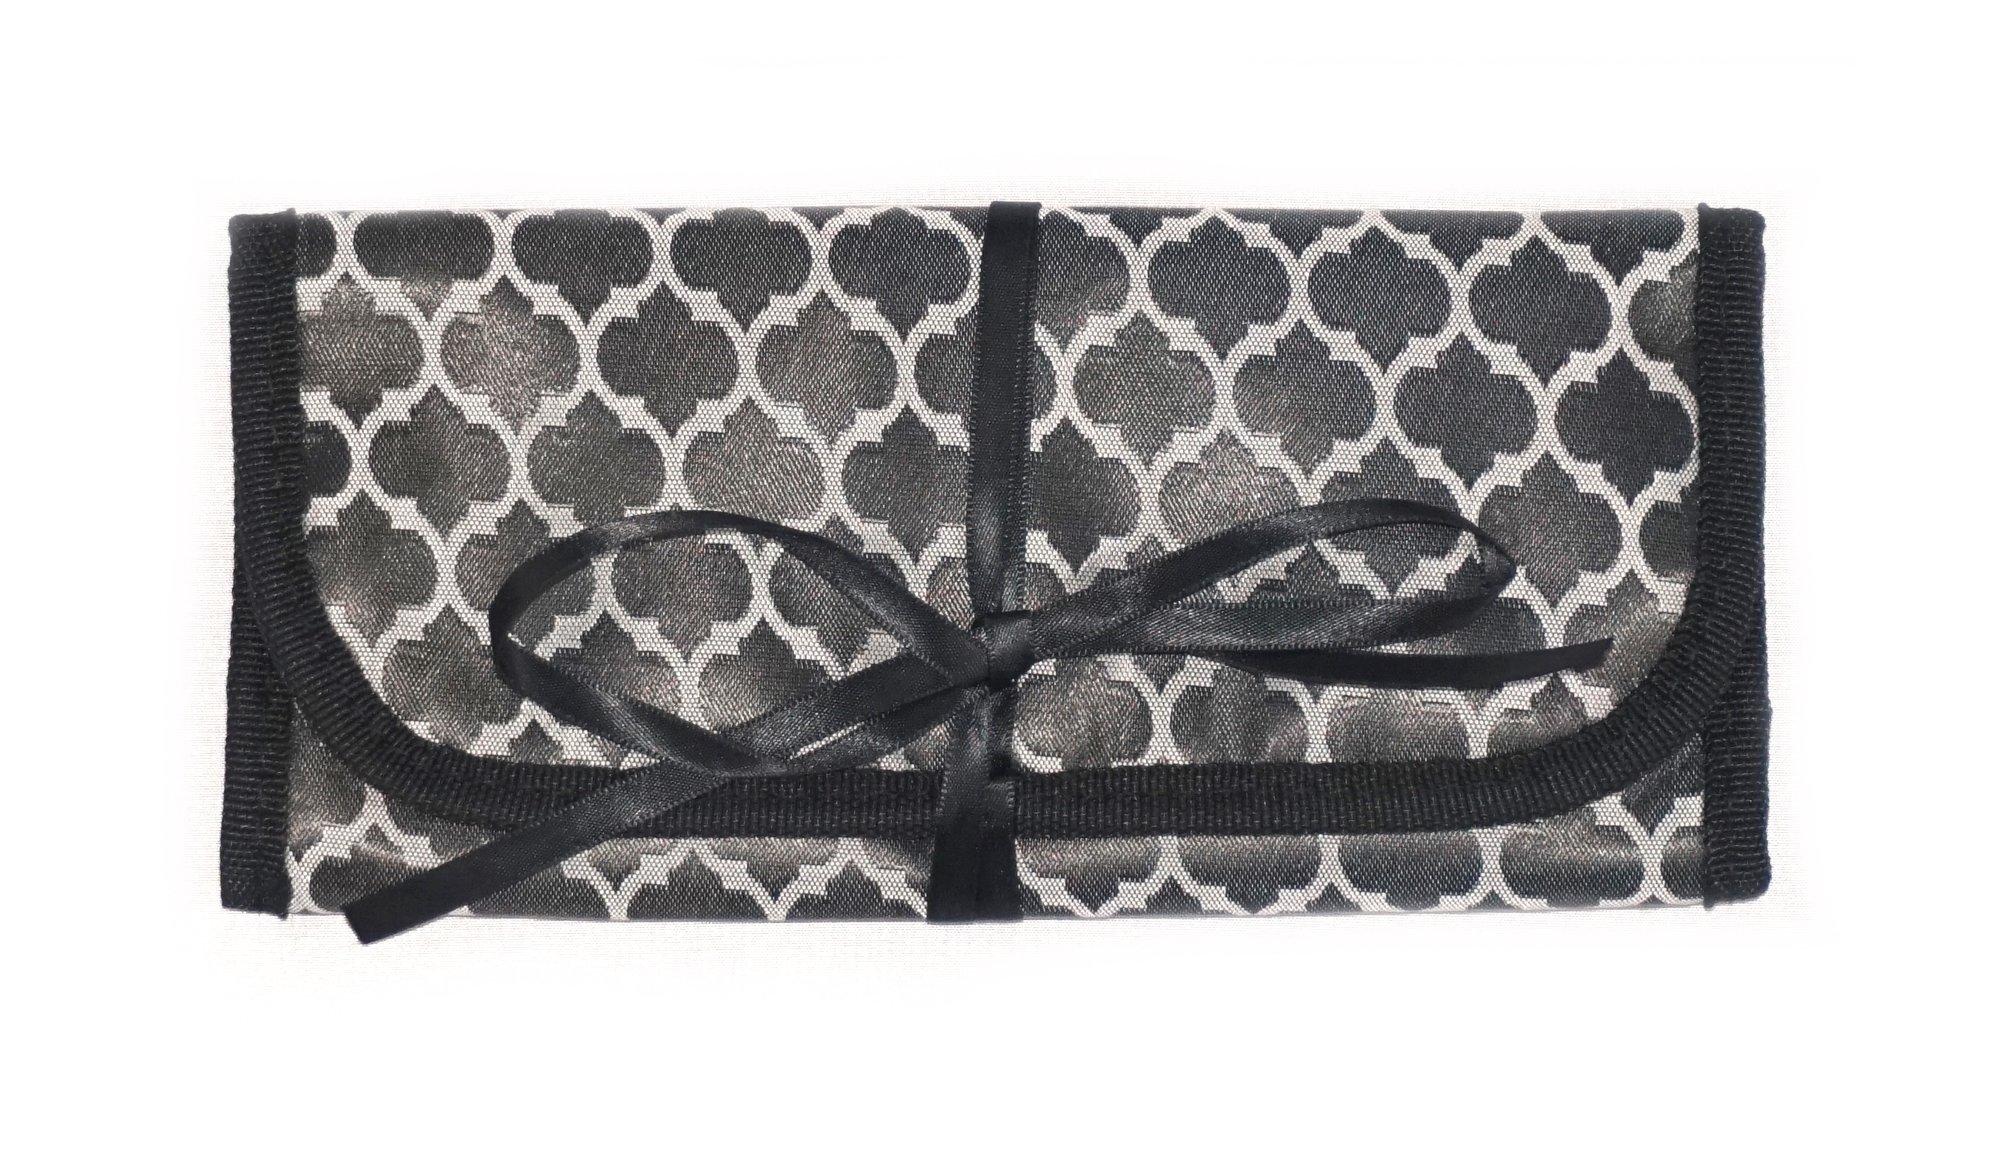 8'' x 11'' Hanging Travel Jewelry & Accessories Organizer Roll Bag (Black & Grey Quatrefoil/Blue)